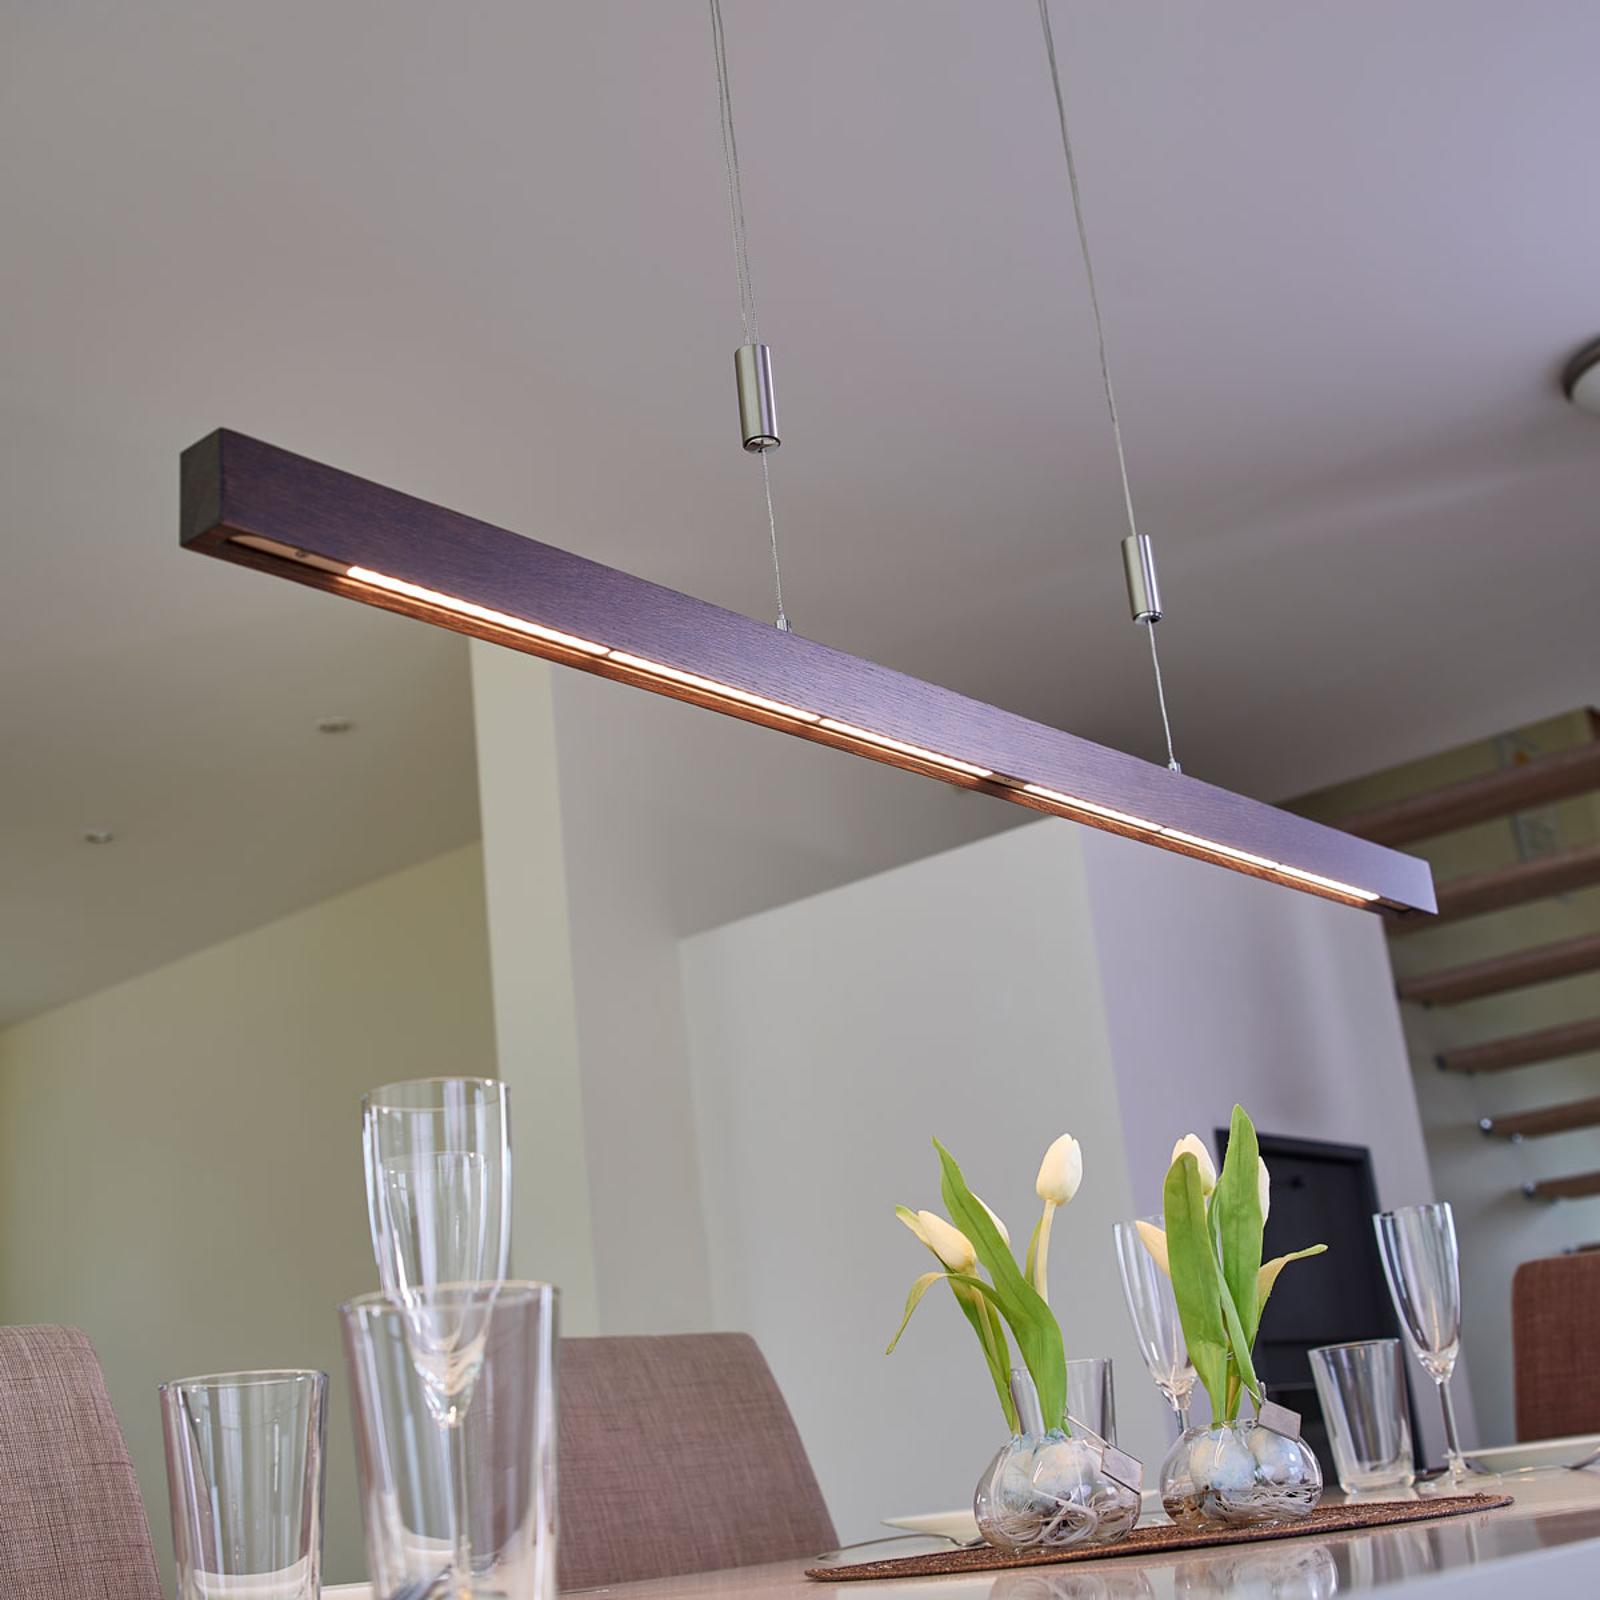 Lampa wisząca LED Nora w formie belki, 118 cm